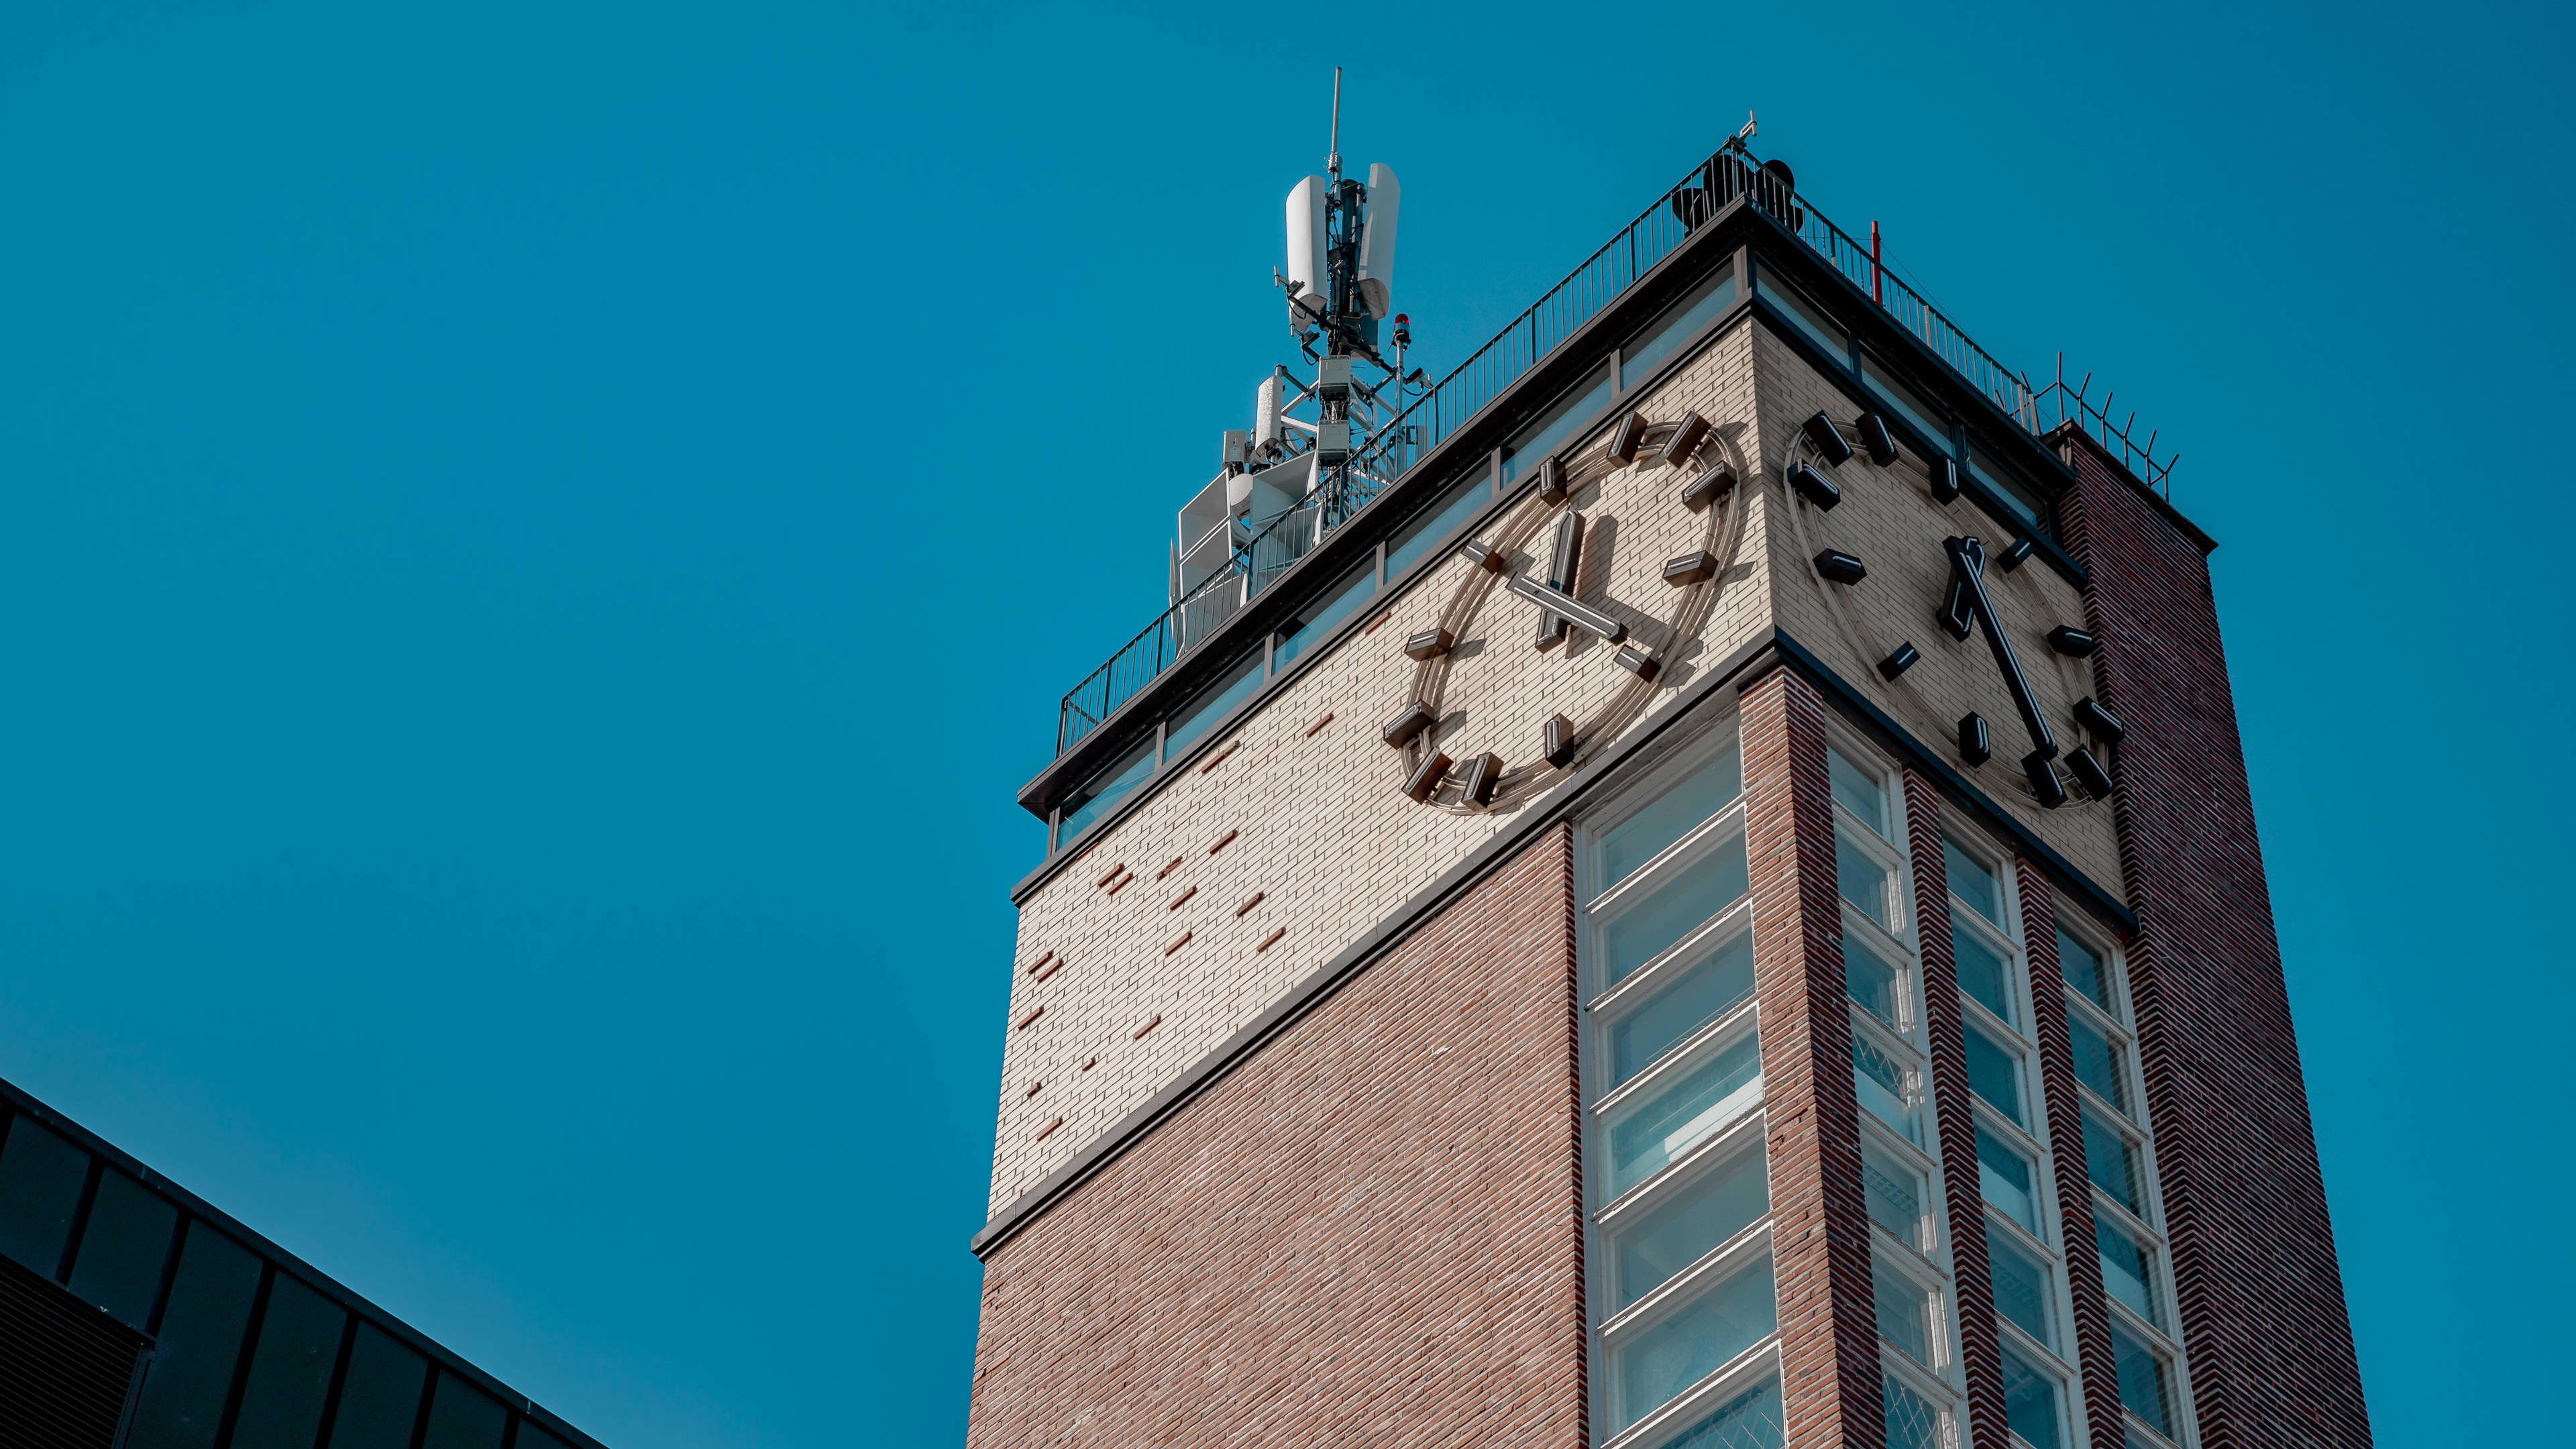 Harjun Vesilinnan torni.